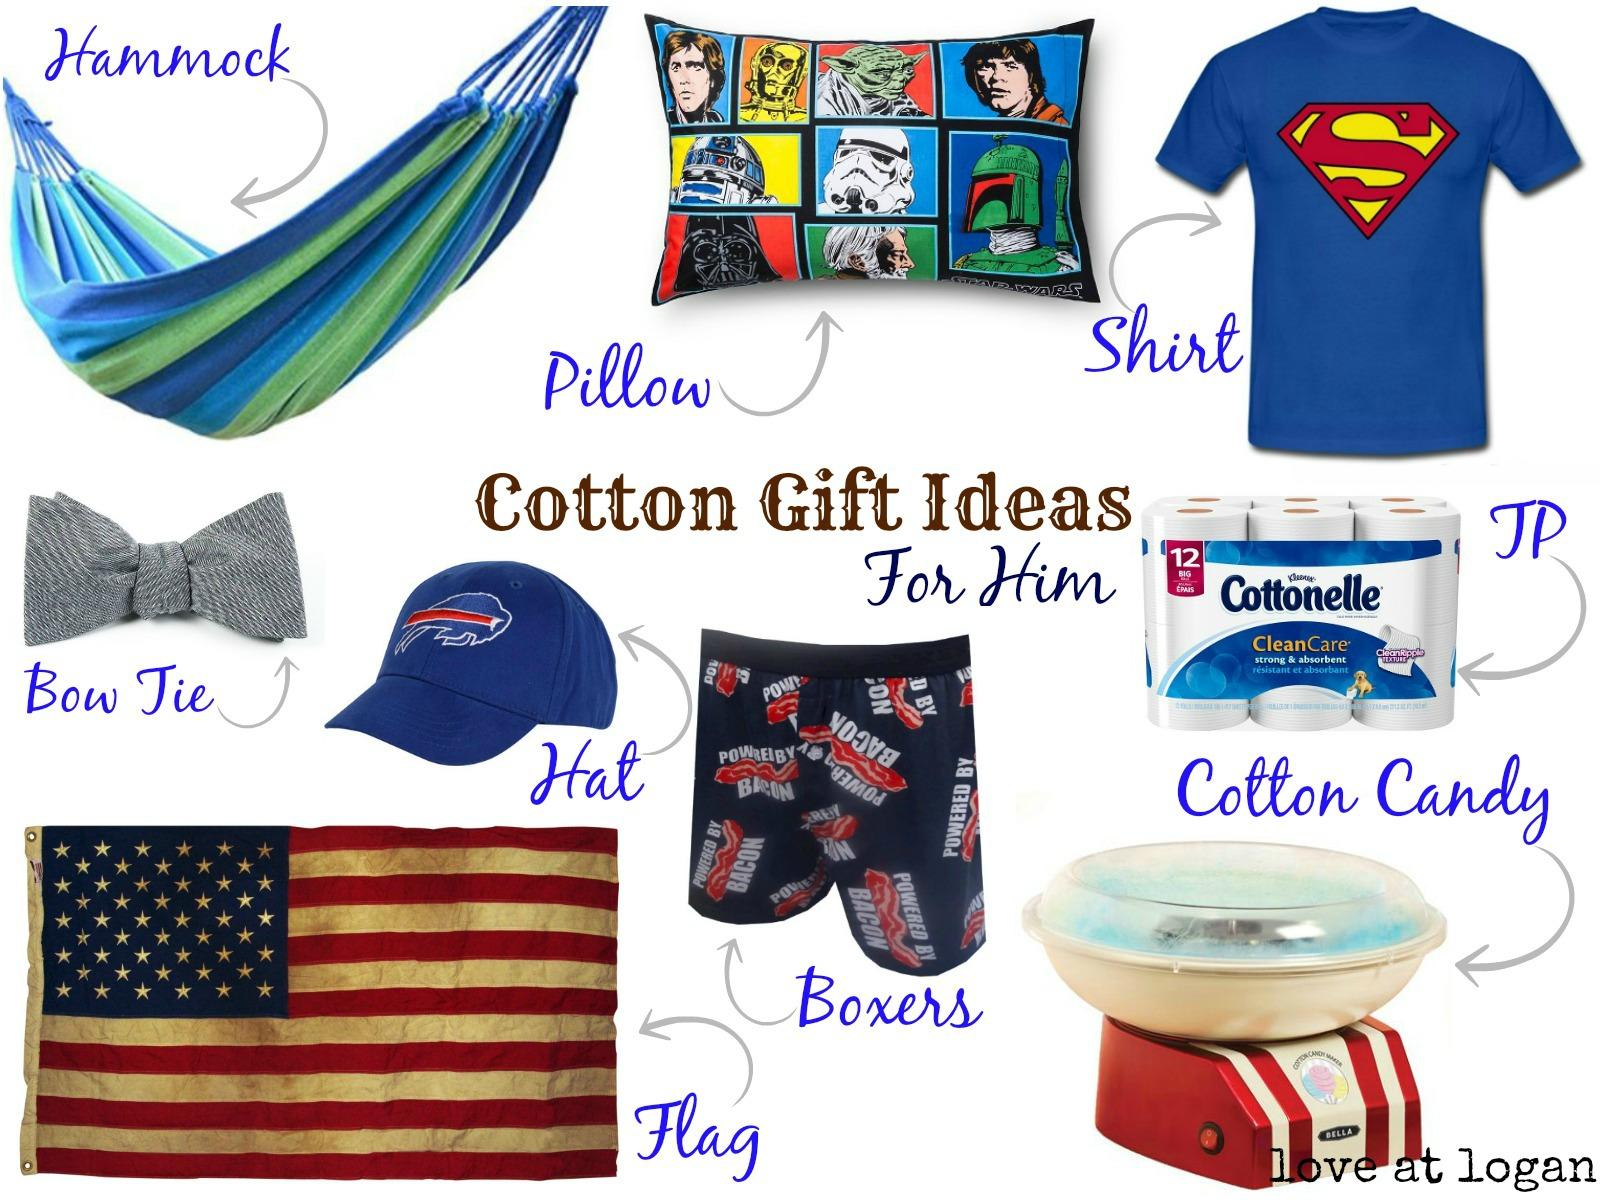 Love At Logan: Second Anniversary Cotton Gift Ideas